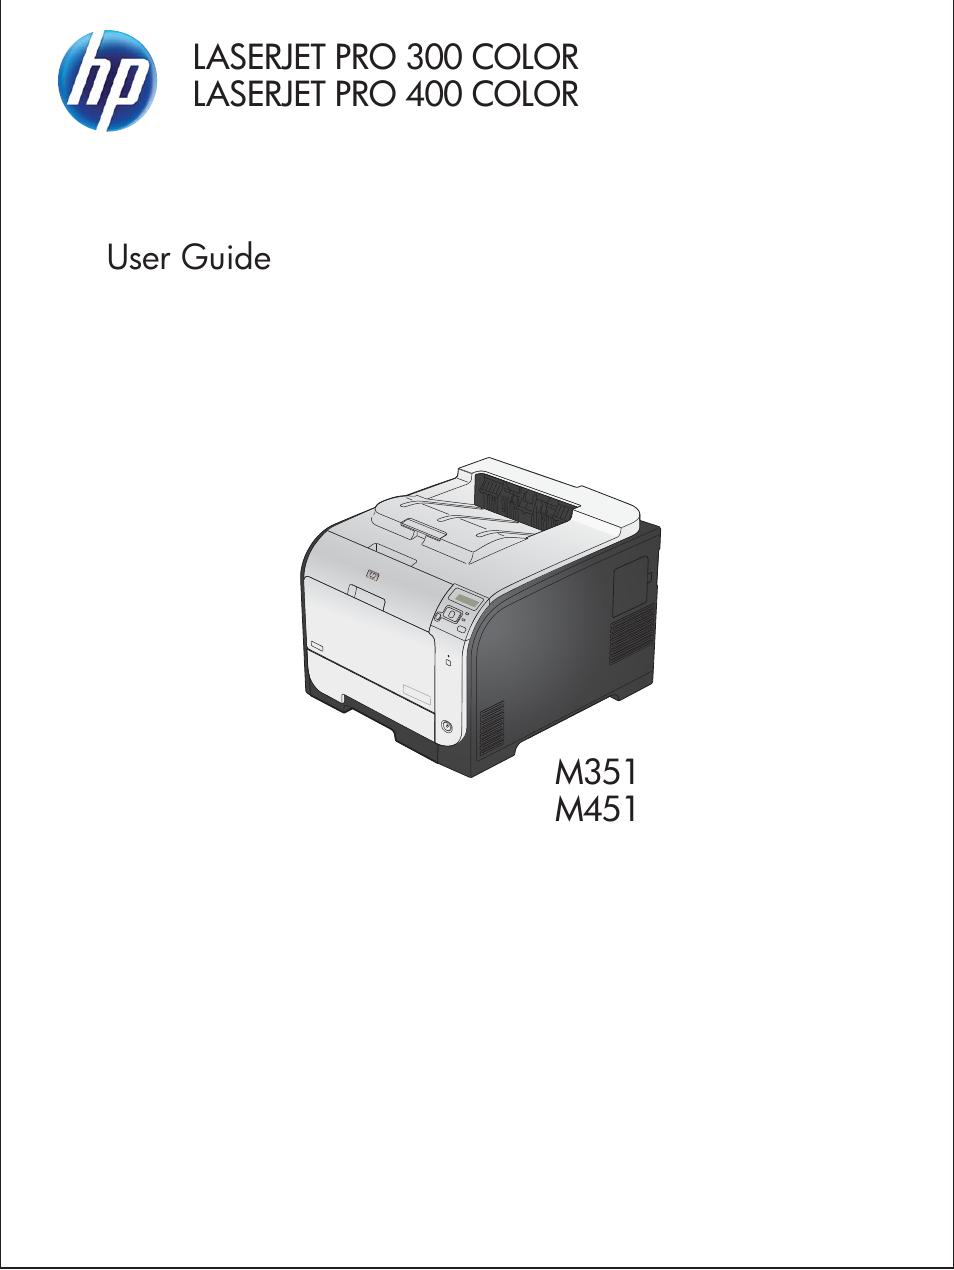 Hp Laserjet Pro 400 Color Printer M451 Series User Manual 242 Pages